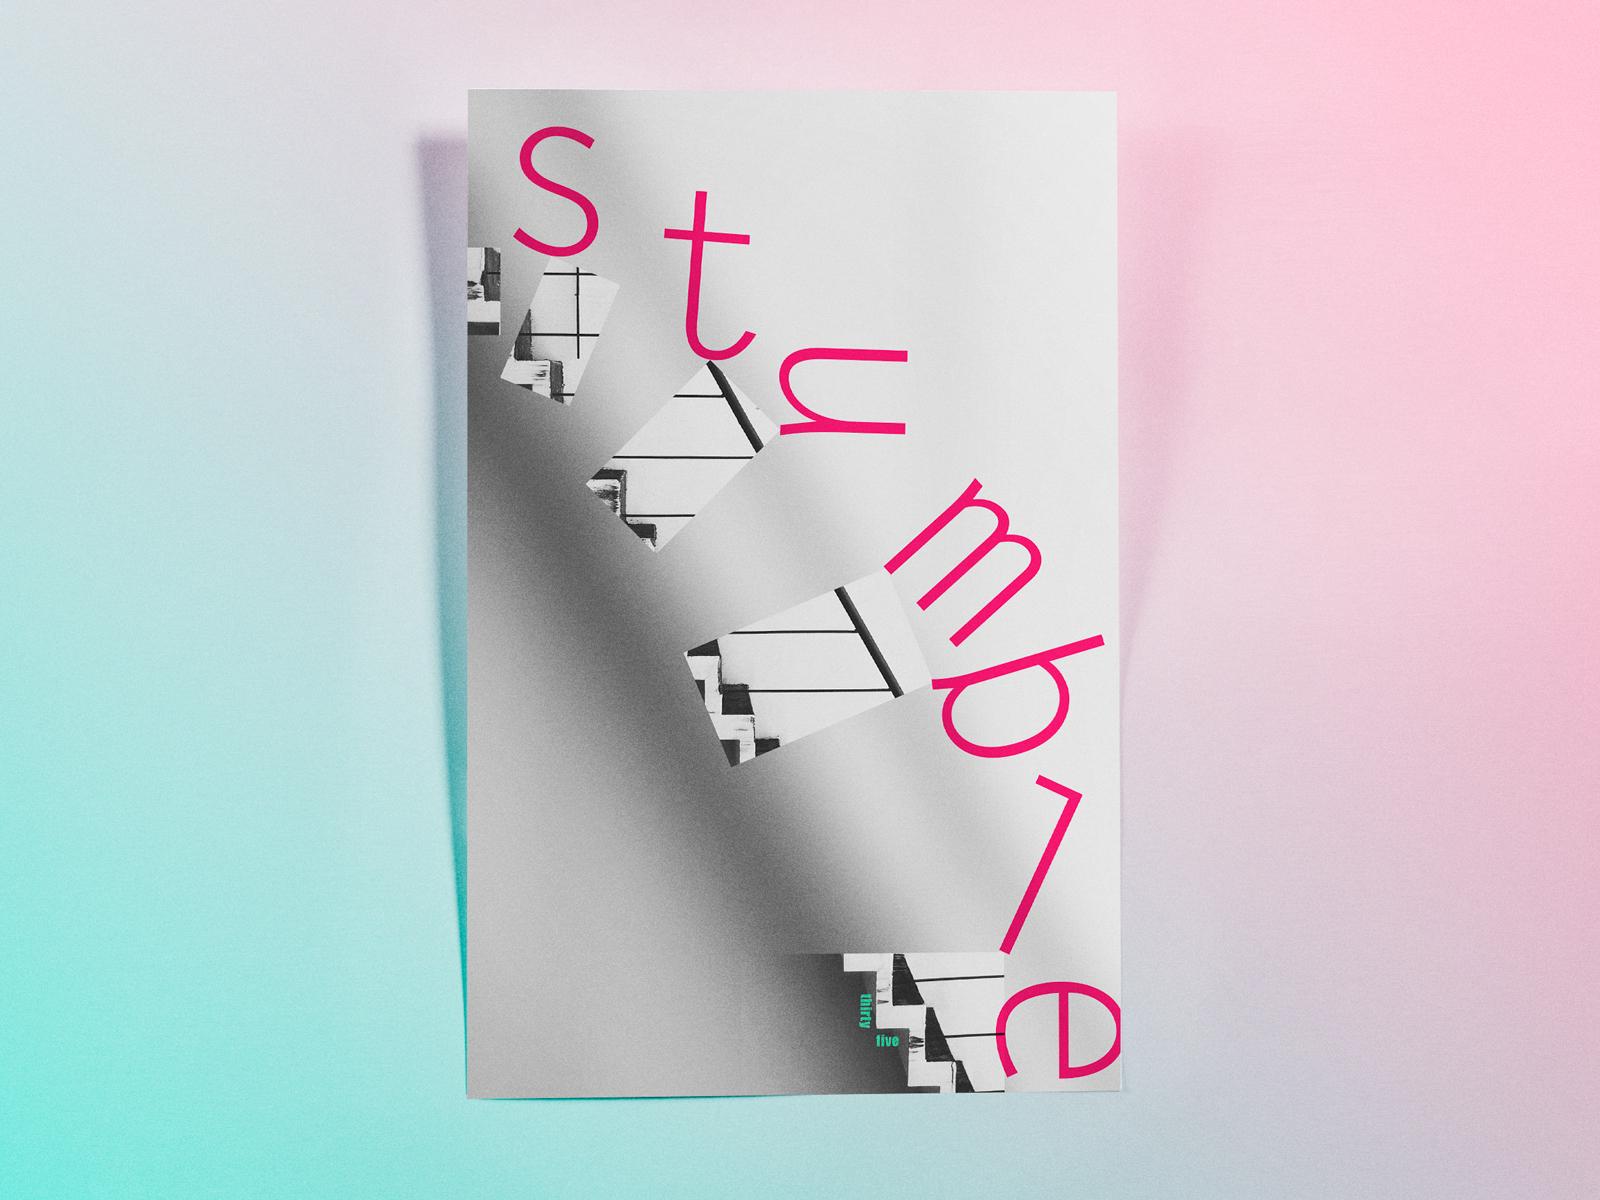 poster-2-18-19_thirtyfive-web-mockup.jpg